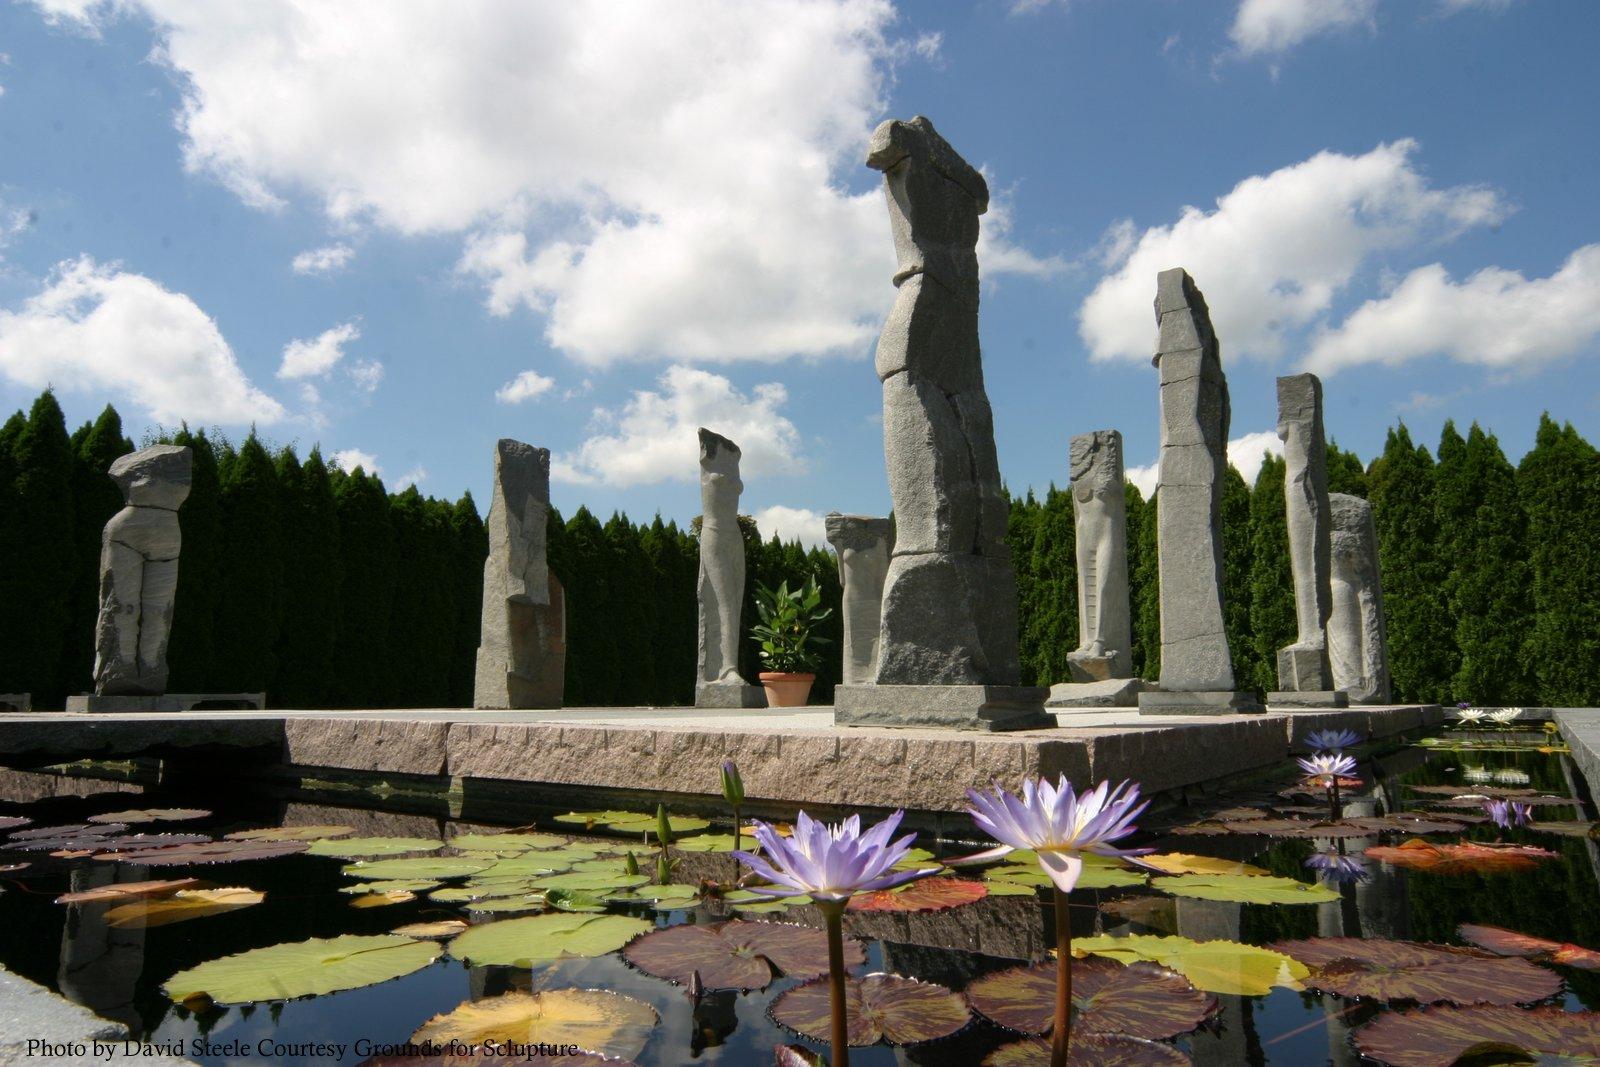 Travel oyster grounds for sculpture for Johnson s farm nj